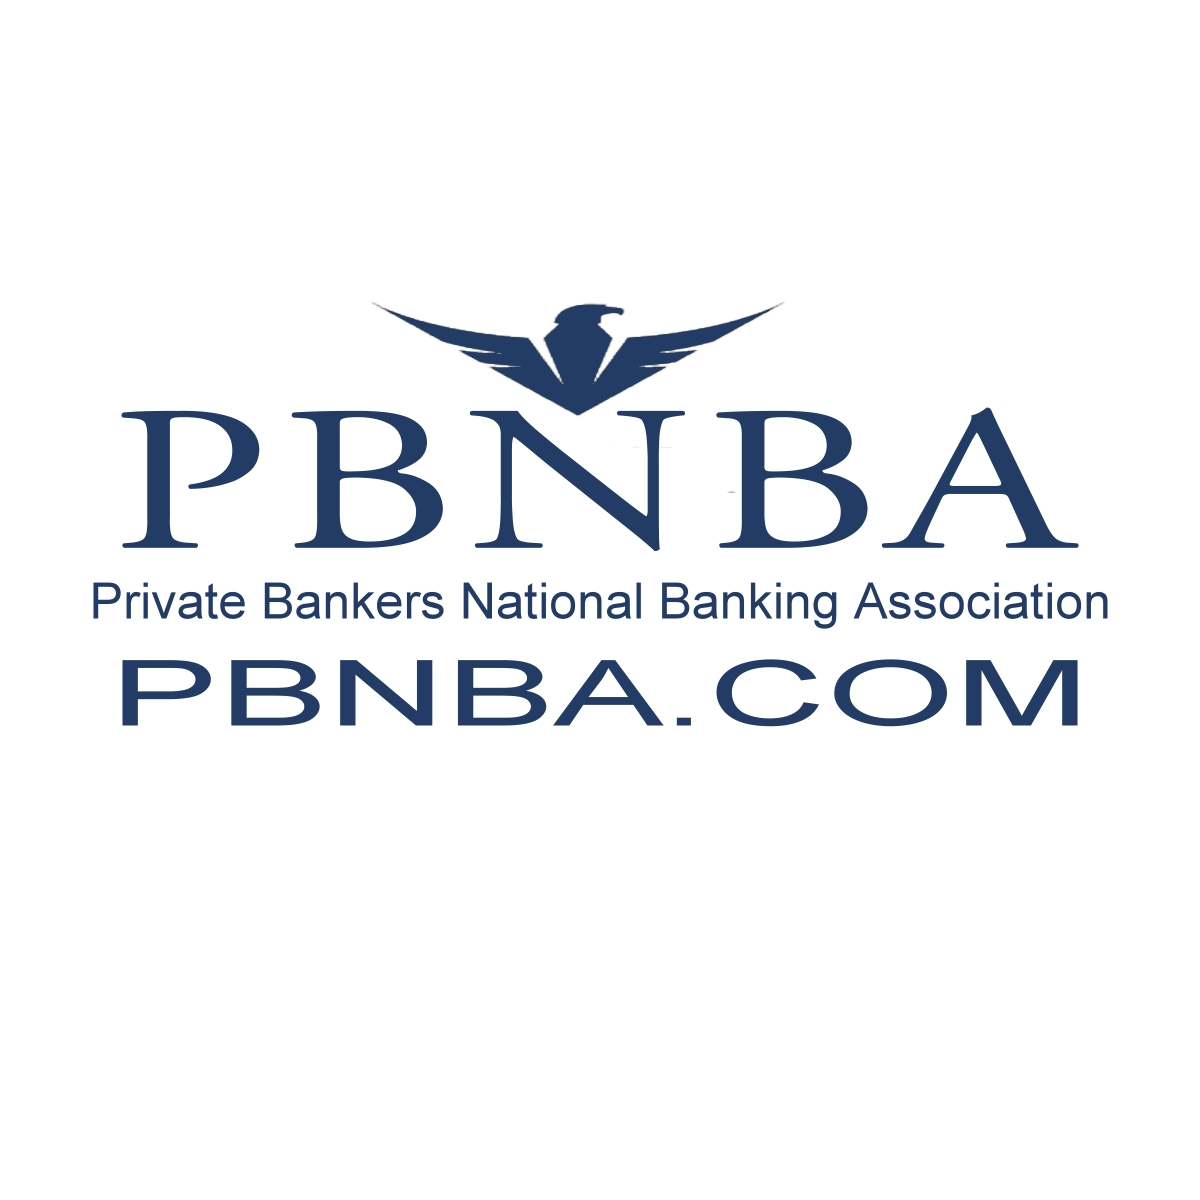 PBNBA Logo